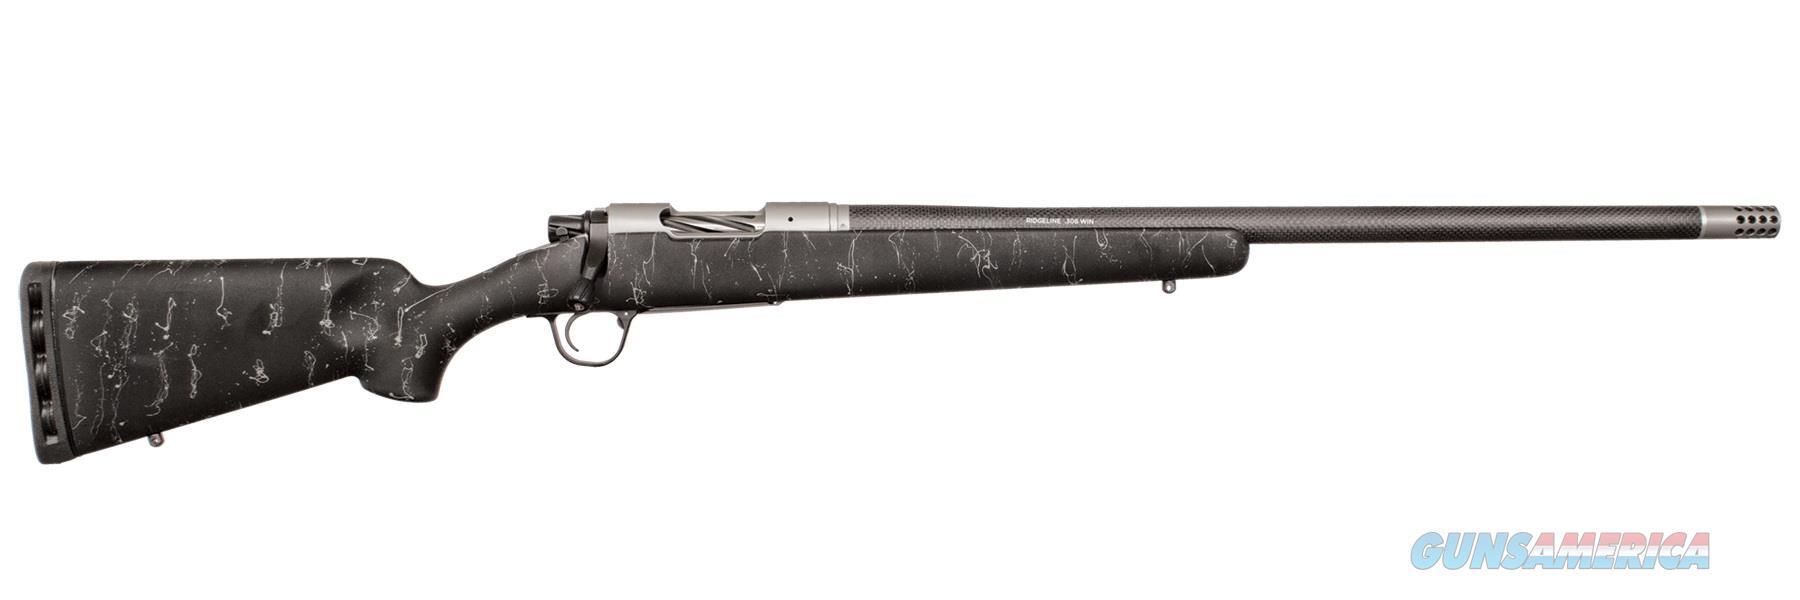 "Ridgeline 6.5Prc Blk/Gry 24"" 801-06005-00  Guns > Rifles > C Misc Rifles"